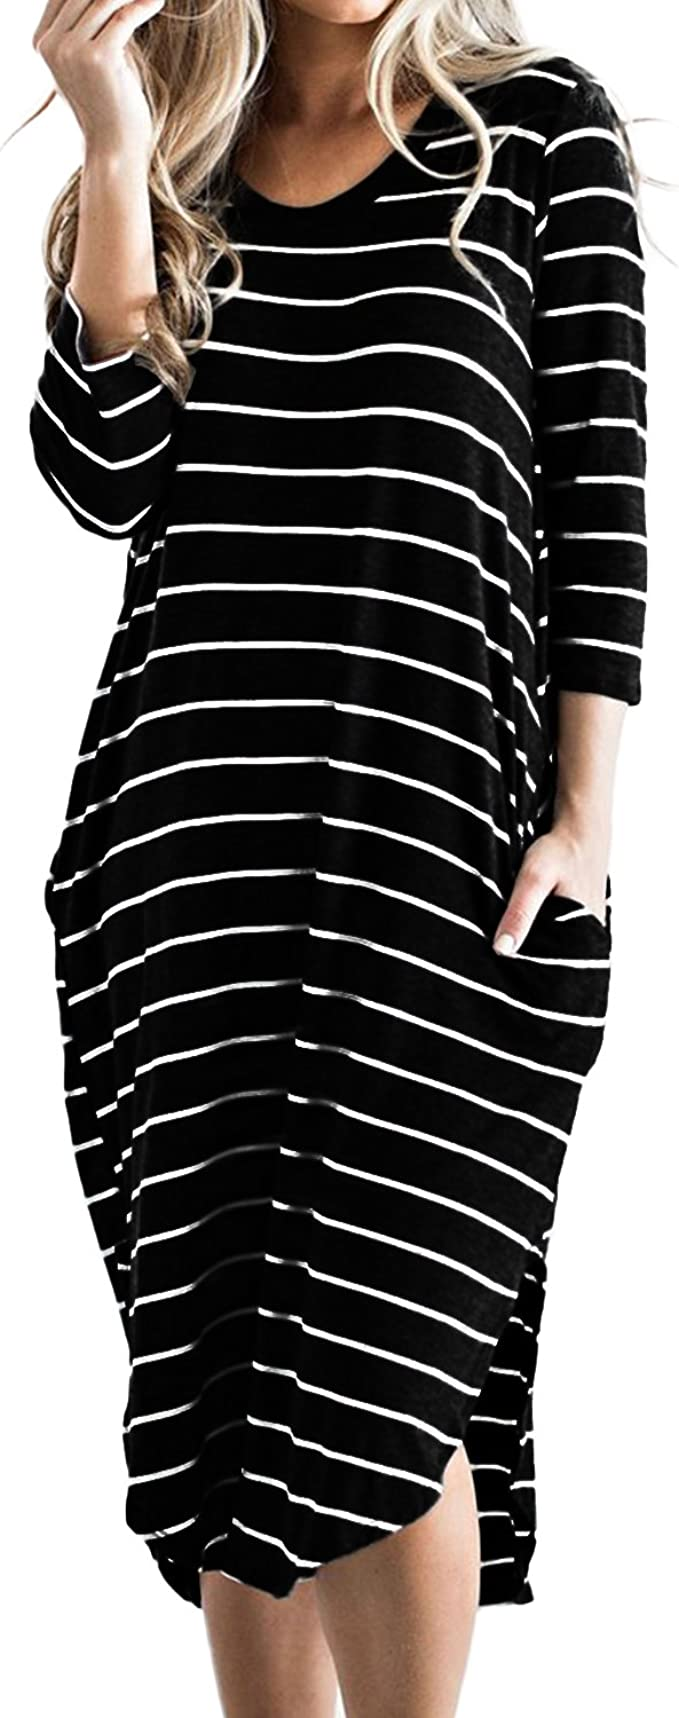 Women Round Neck Casual Long Shirt Dress Summer T-Shirt Dress Midi Dress Plus